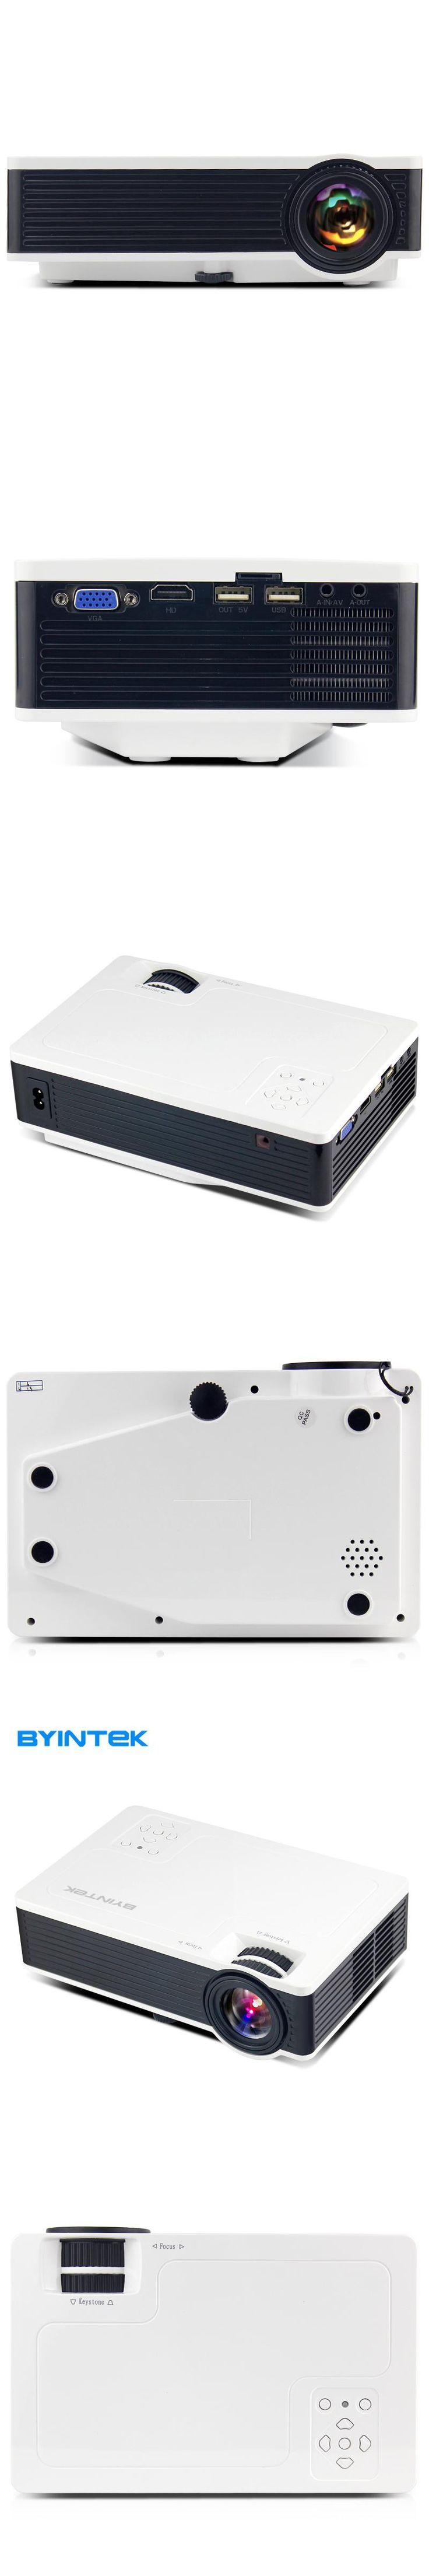 BYINTEK ML217 New USB 1800lumens Game Home Theater LED Digital Video Pico Mini Projector HD Proyector Projetor Beamer 1080P